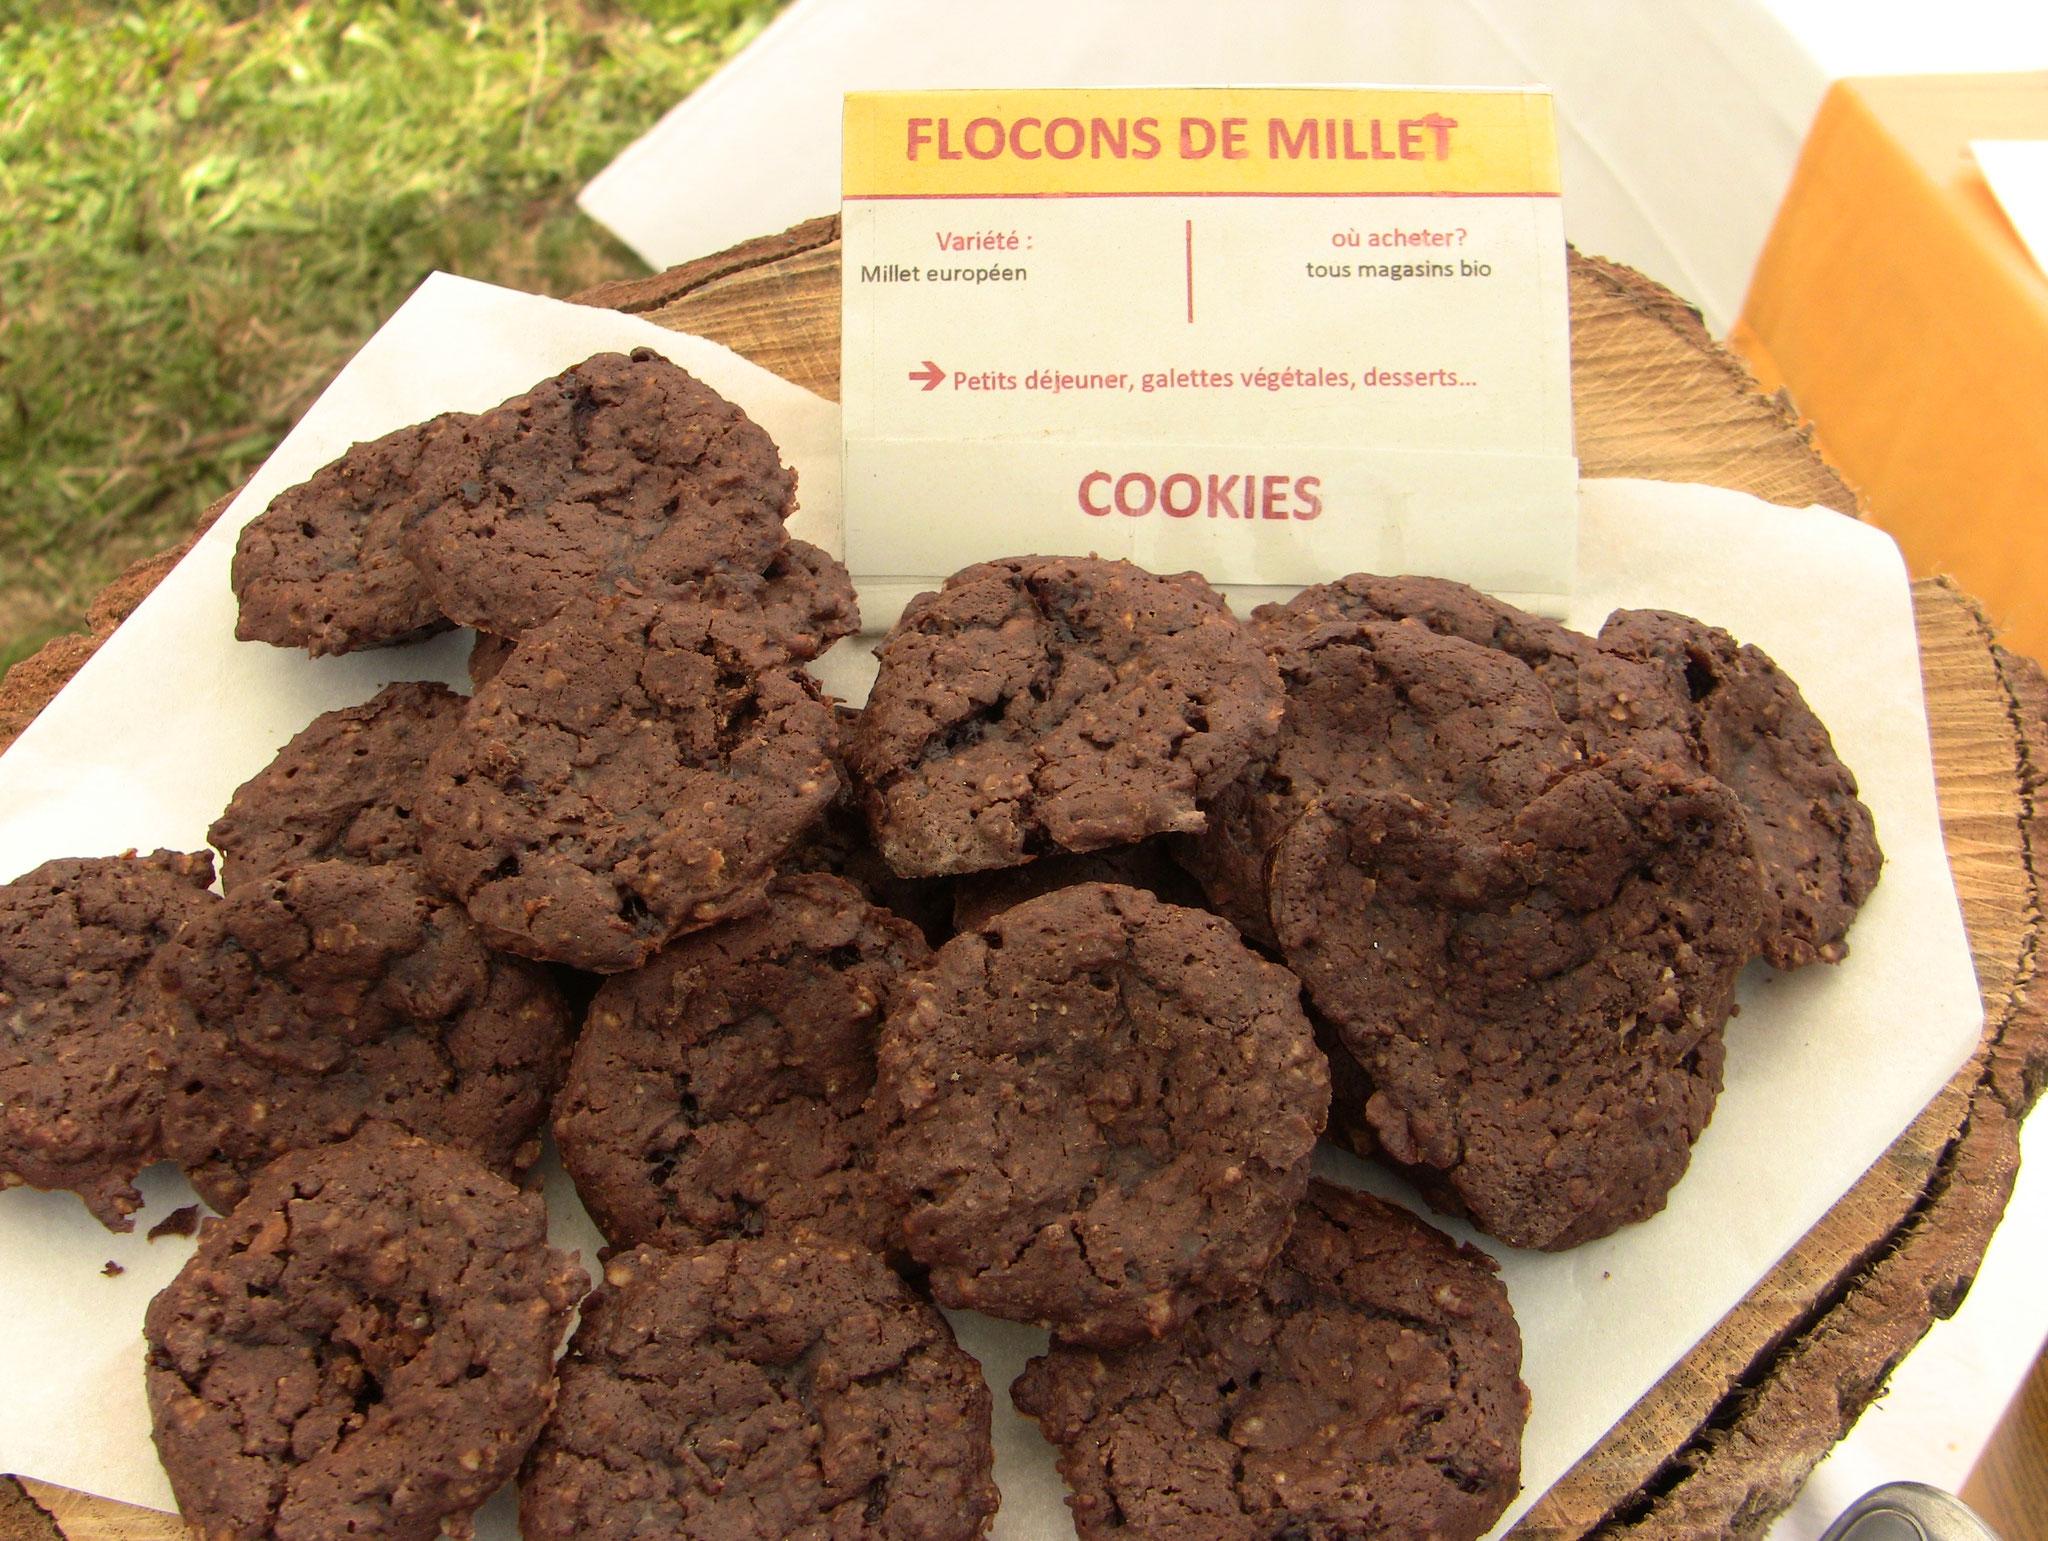 Terra Millet - cookies au millet alléchants!